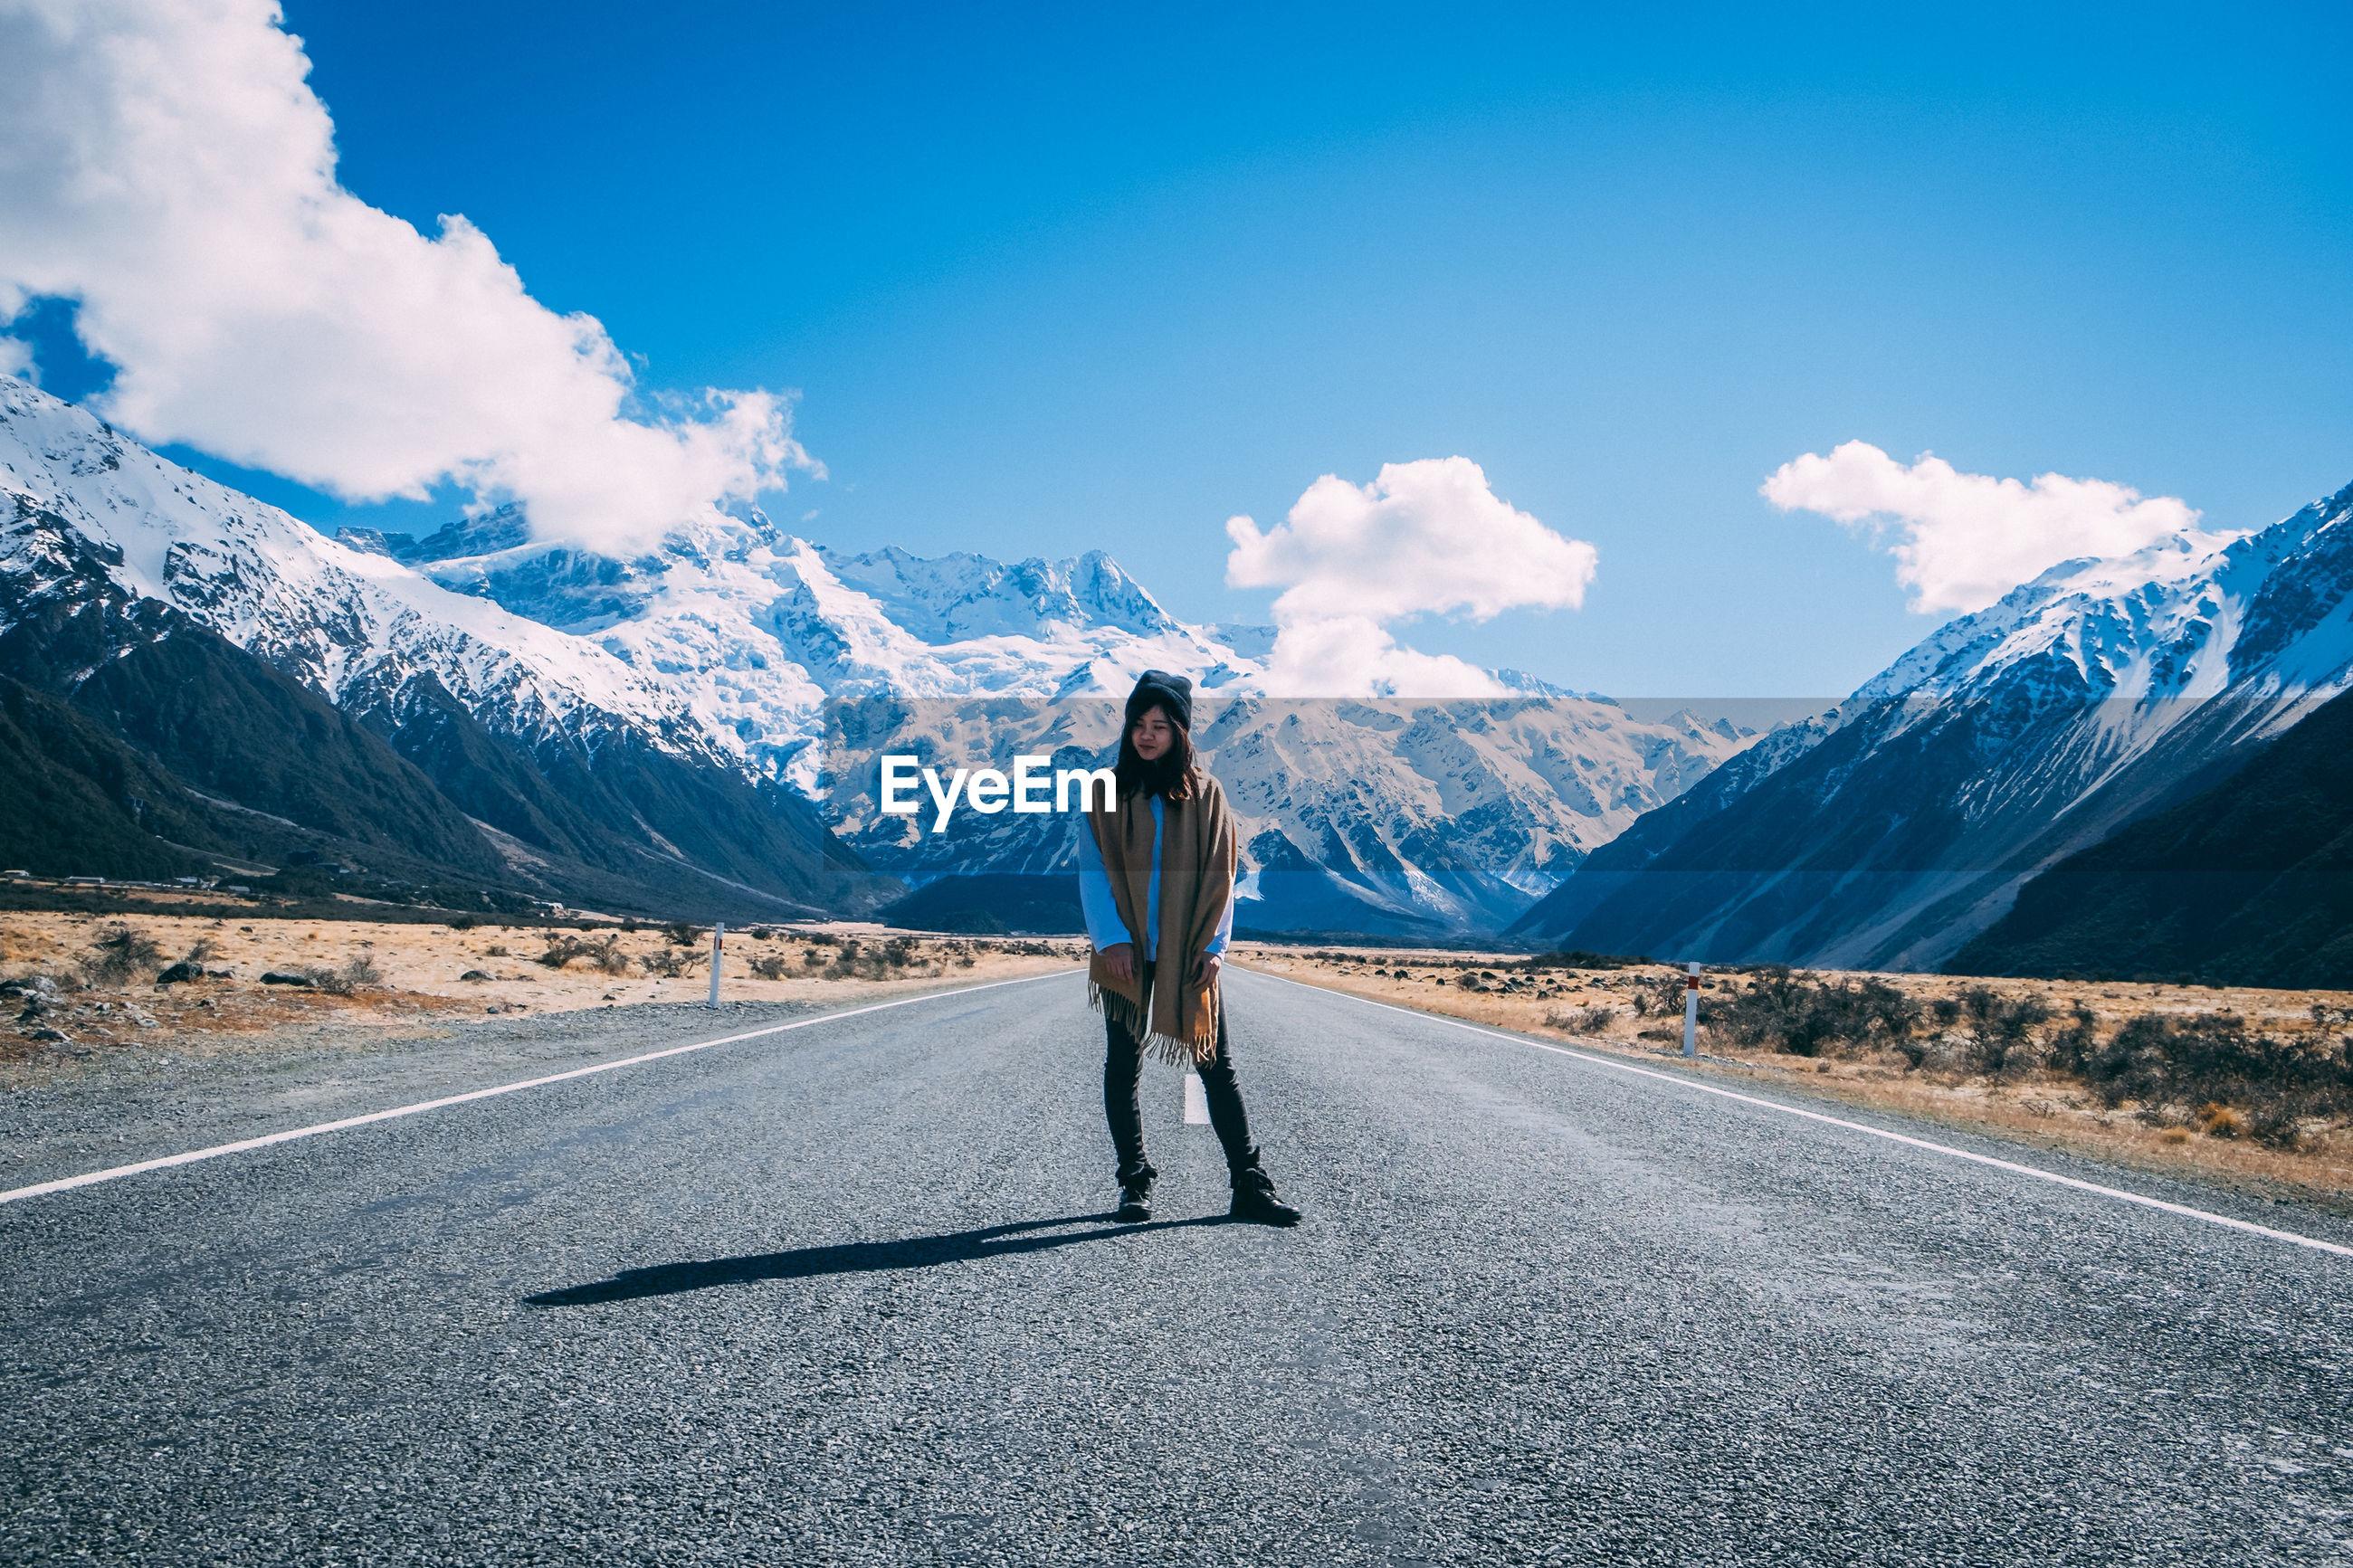 Travel vibe. group friend road trip. friendship. new zealand